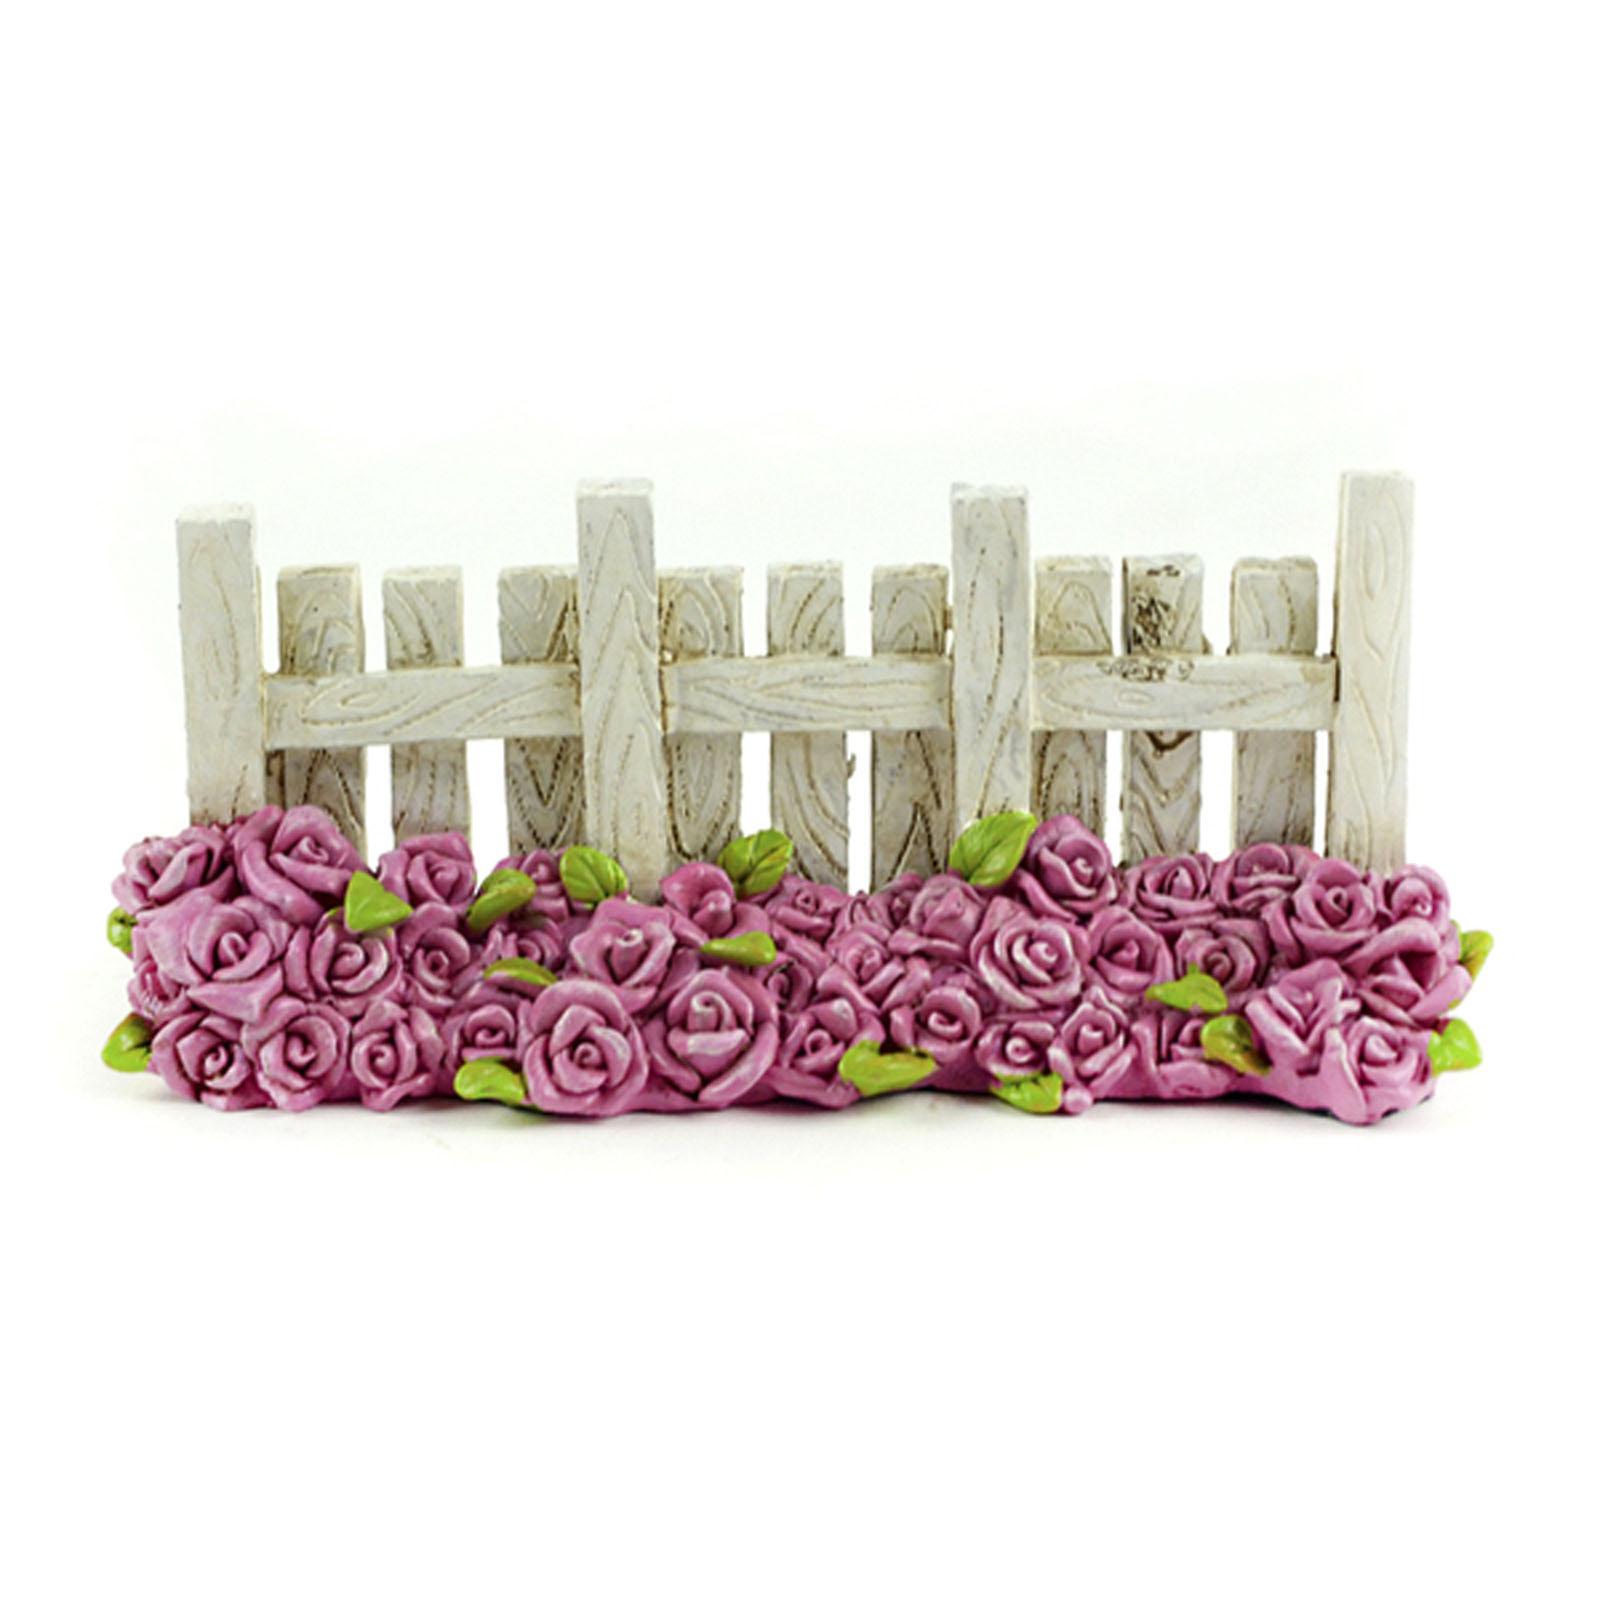 "Christmas Decorations Santa Clarita Ca: 5"" Fairy Garden White Picket Fence Rose Flower Spring"